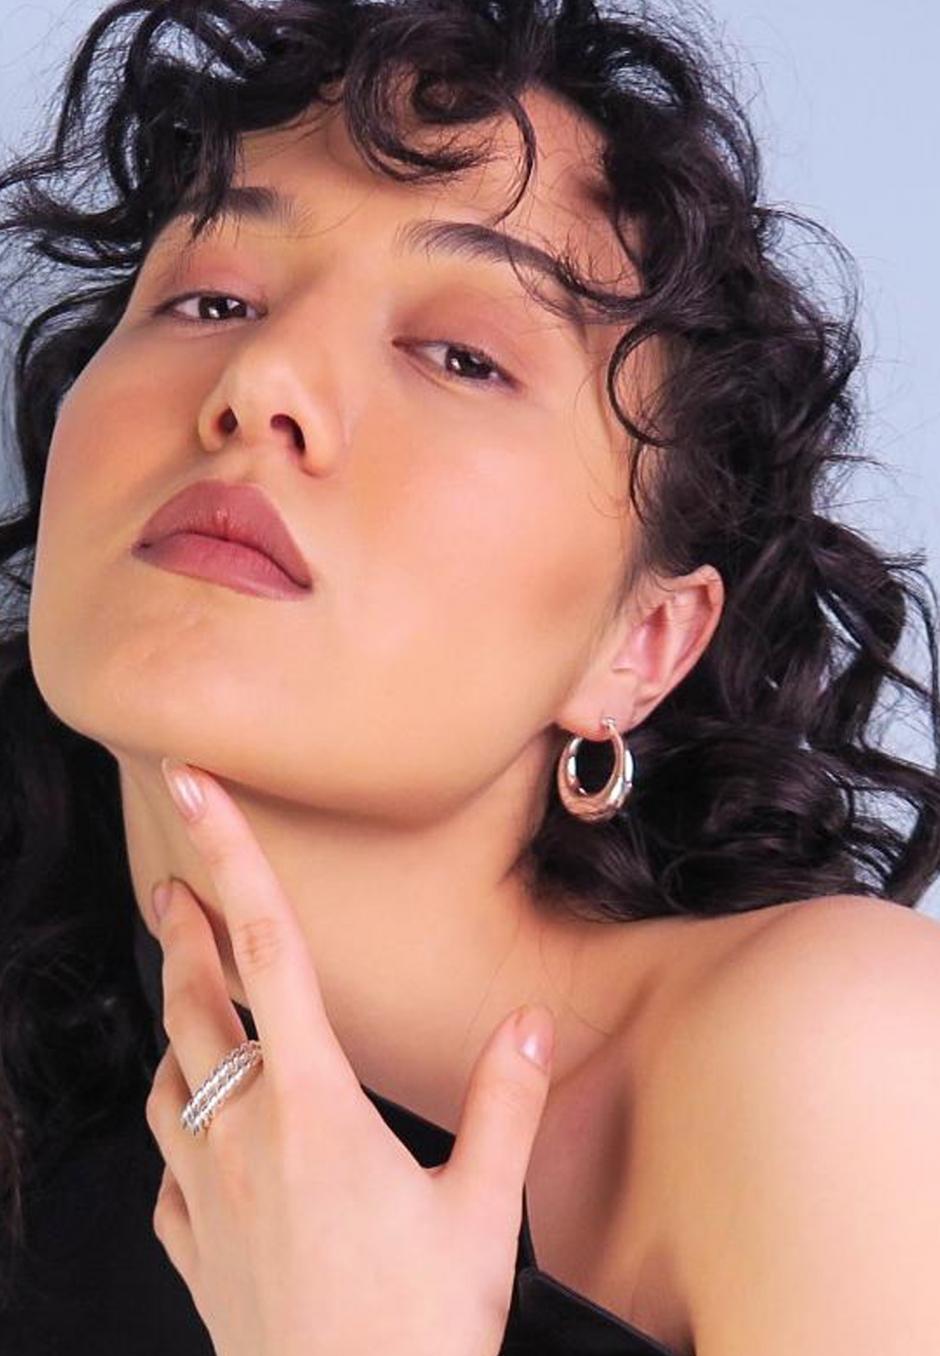 Wos Polly Earrings